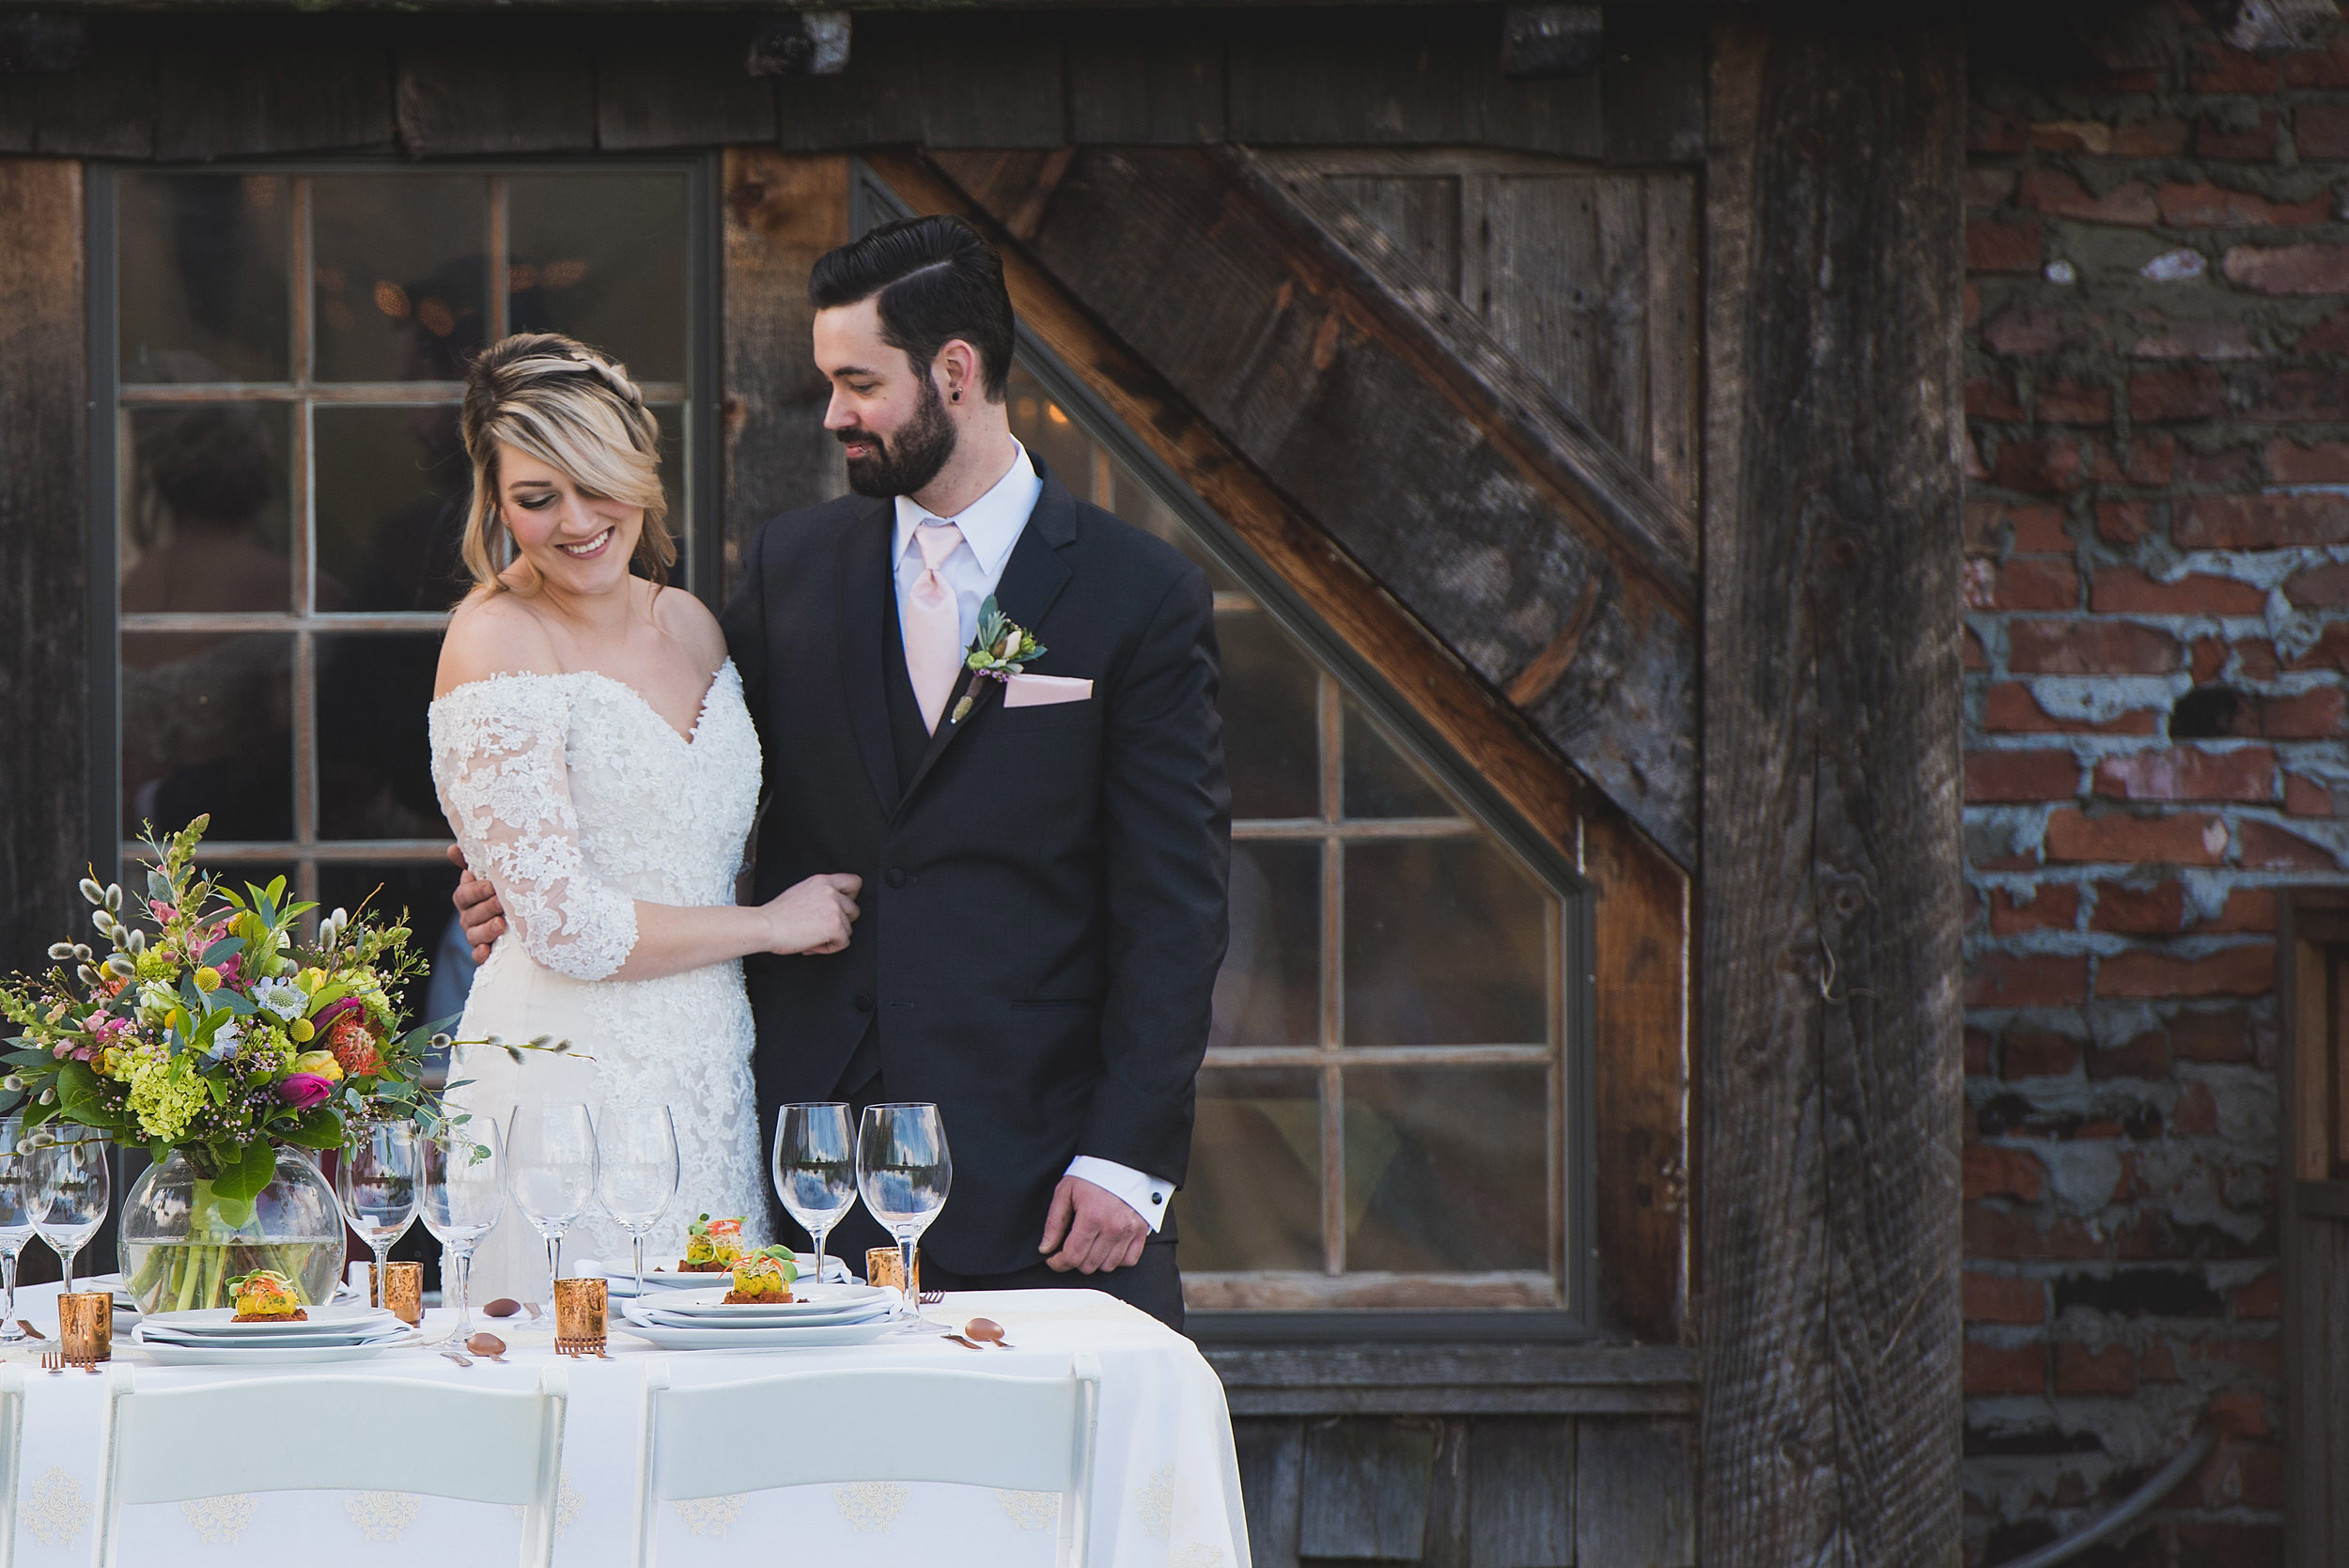 Spring Wedding Testimonial - Sublime Celebrations